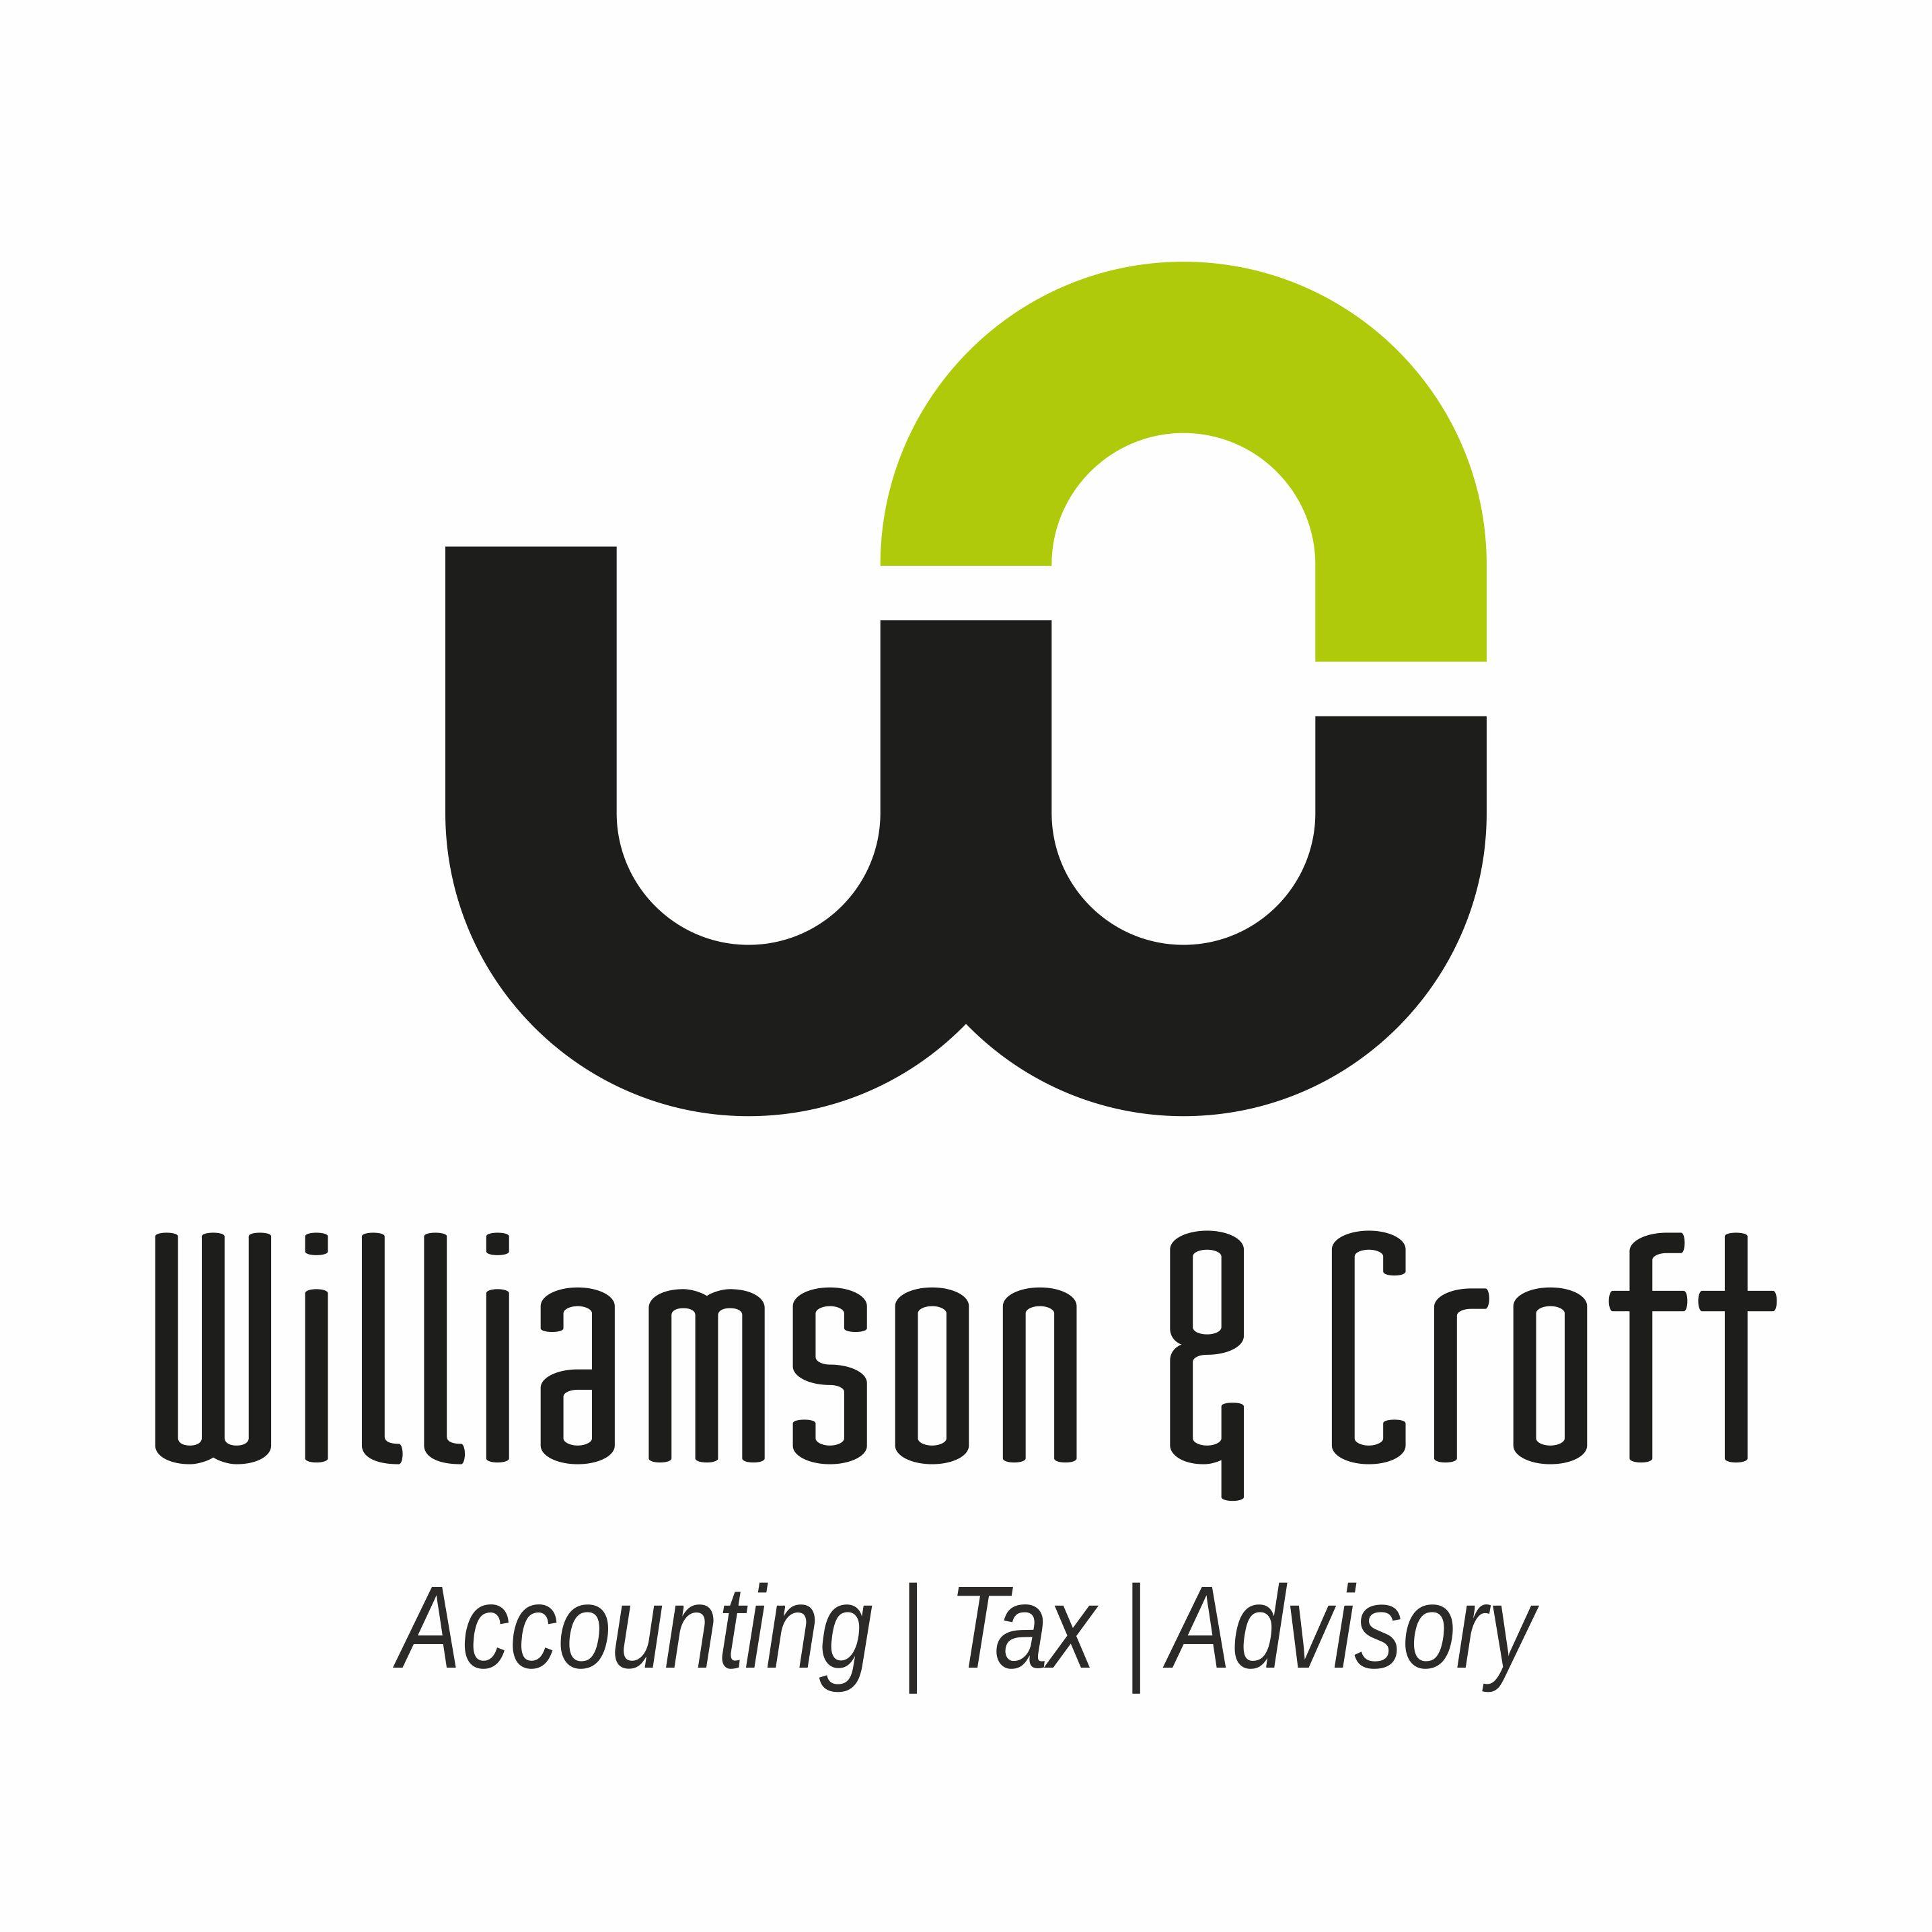 Williamson & Croft LLP